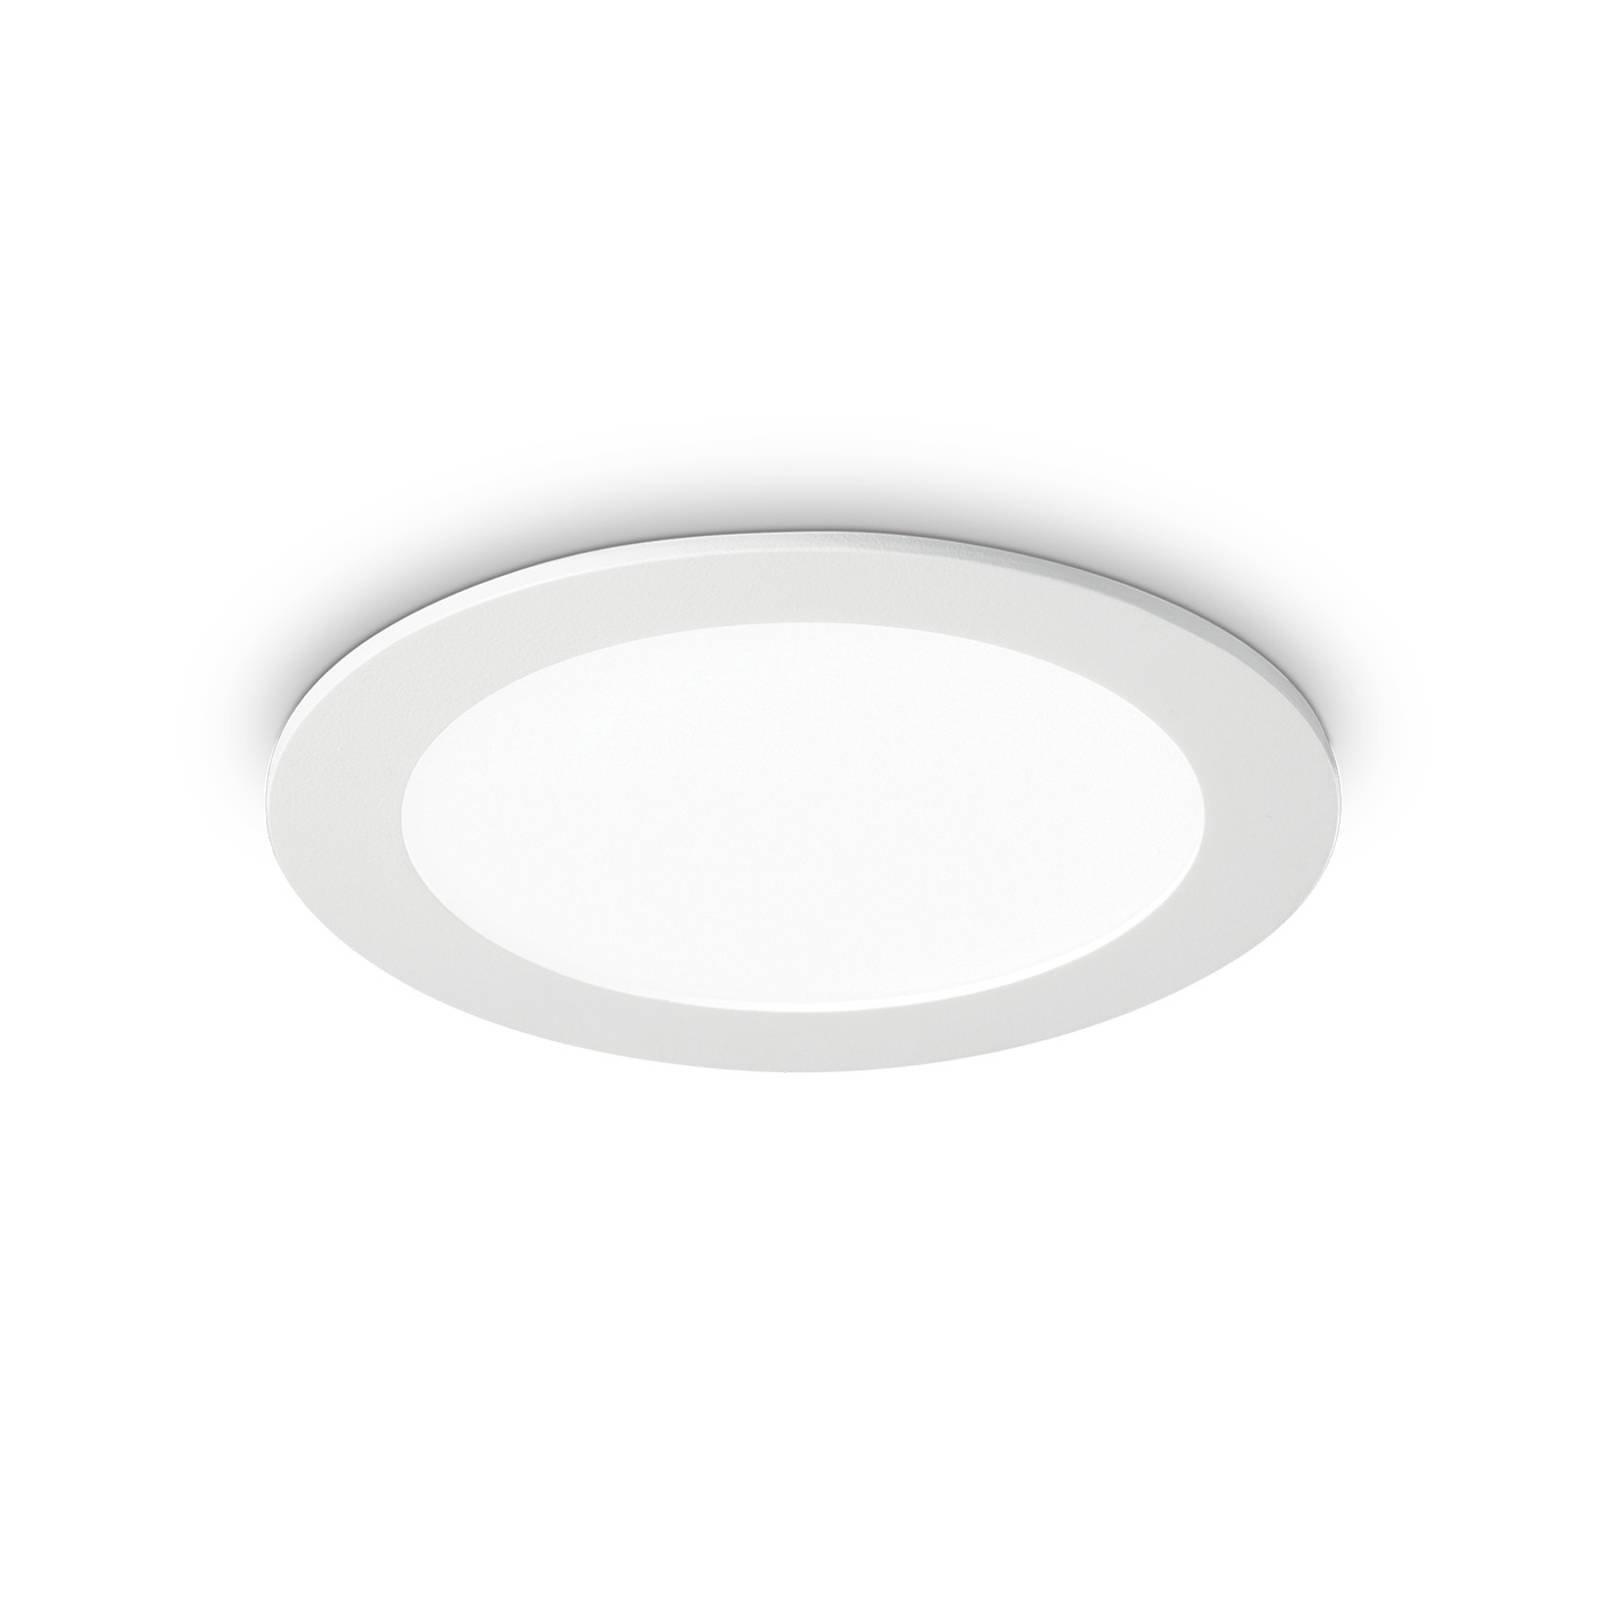 LED-taklampe Groove round, 3 000 K, 11,8 cm